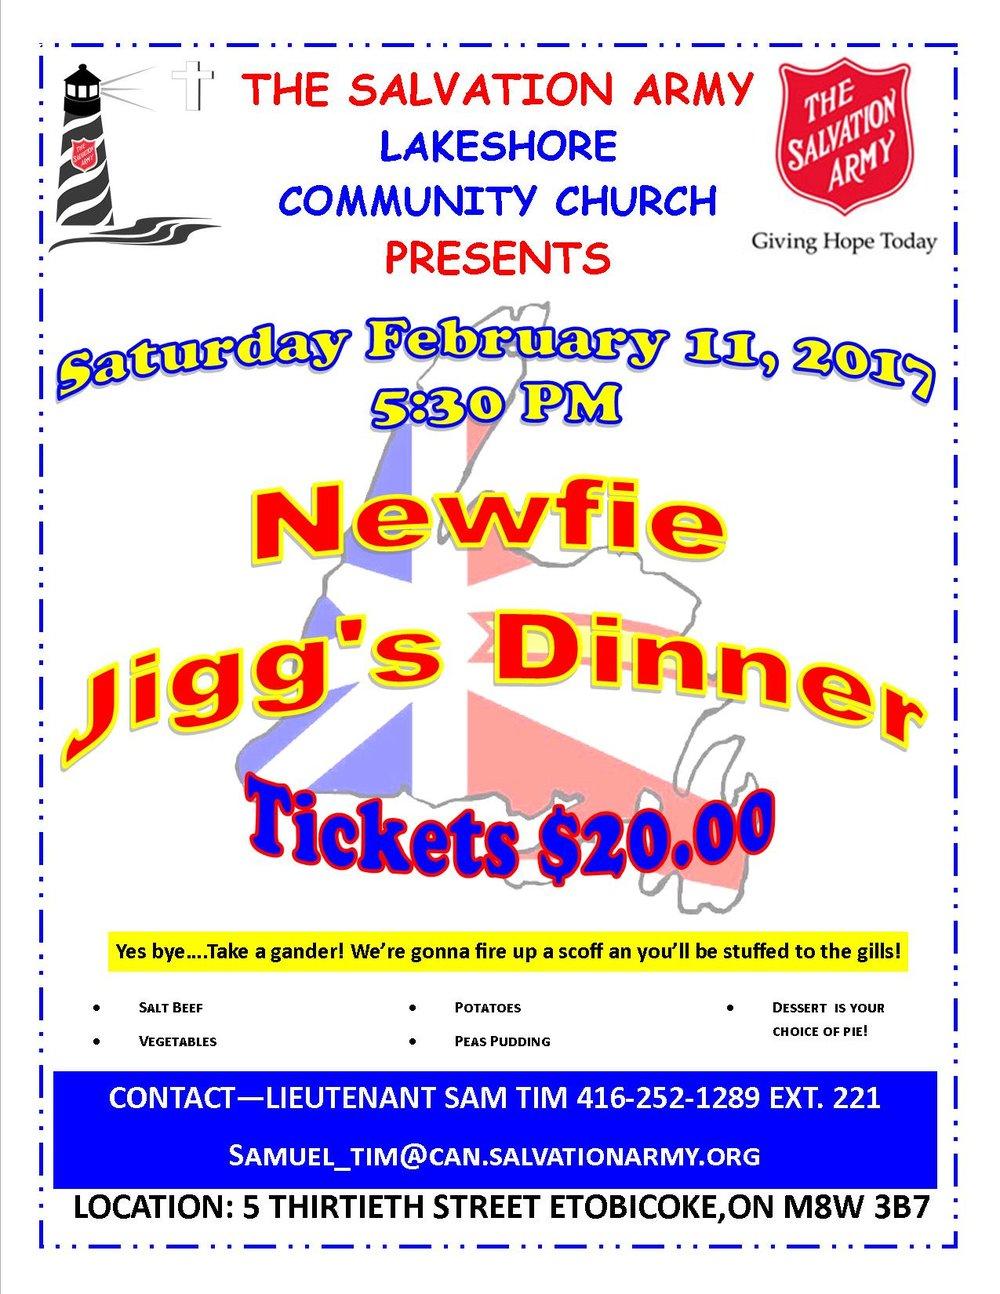 1Poster Newfie Jiggs Dinner 11-02-17.jpg